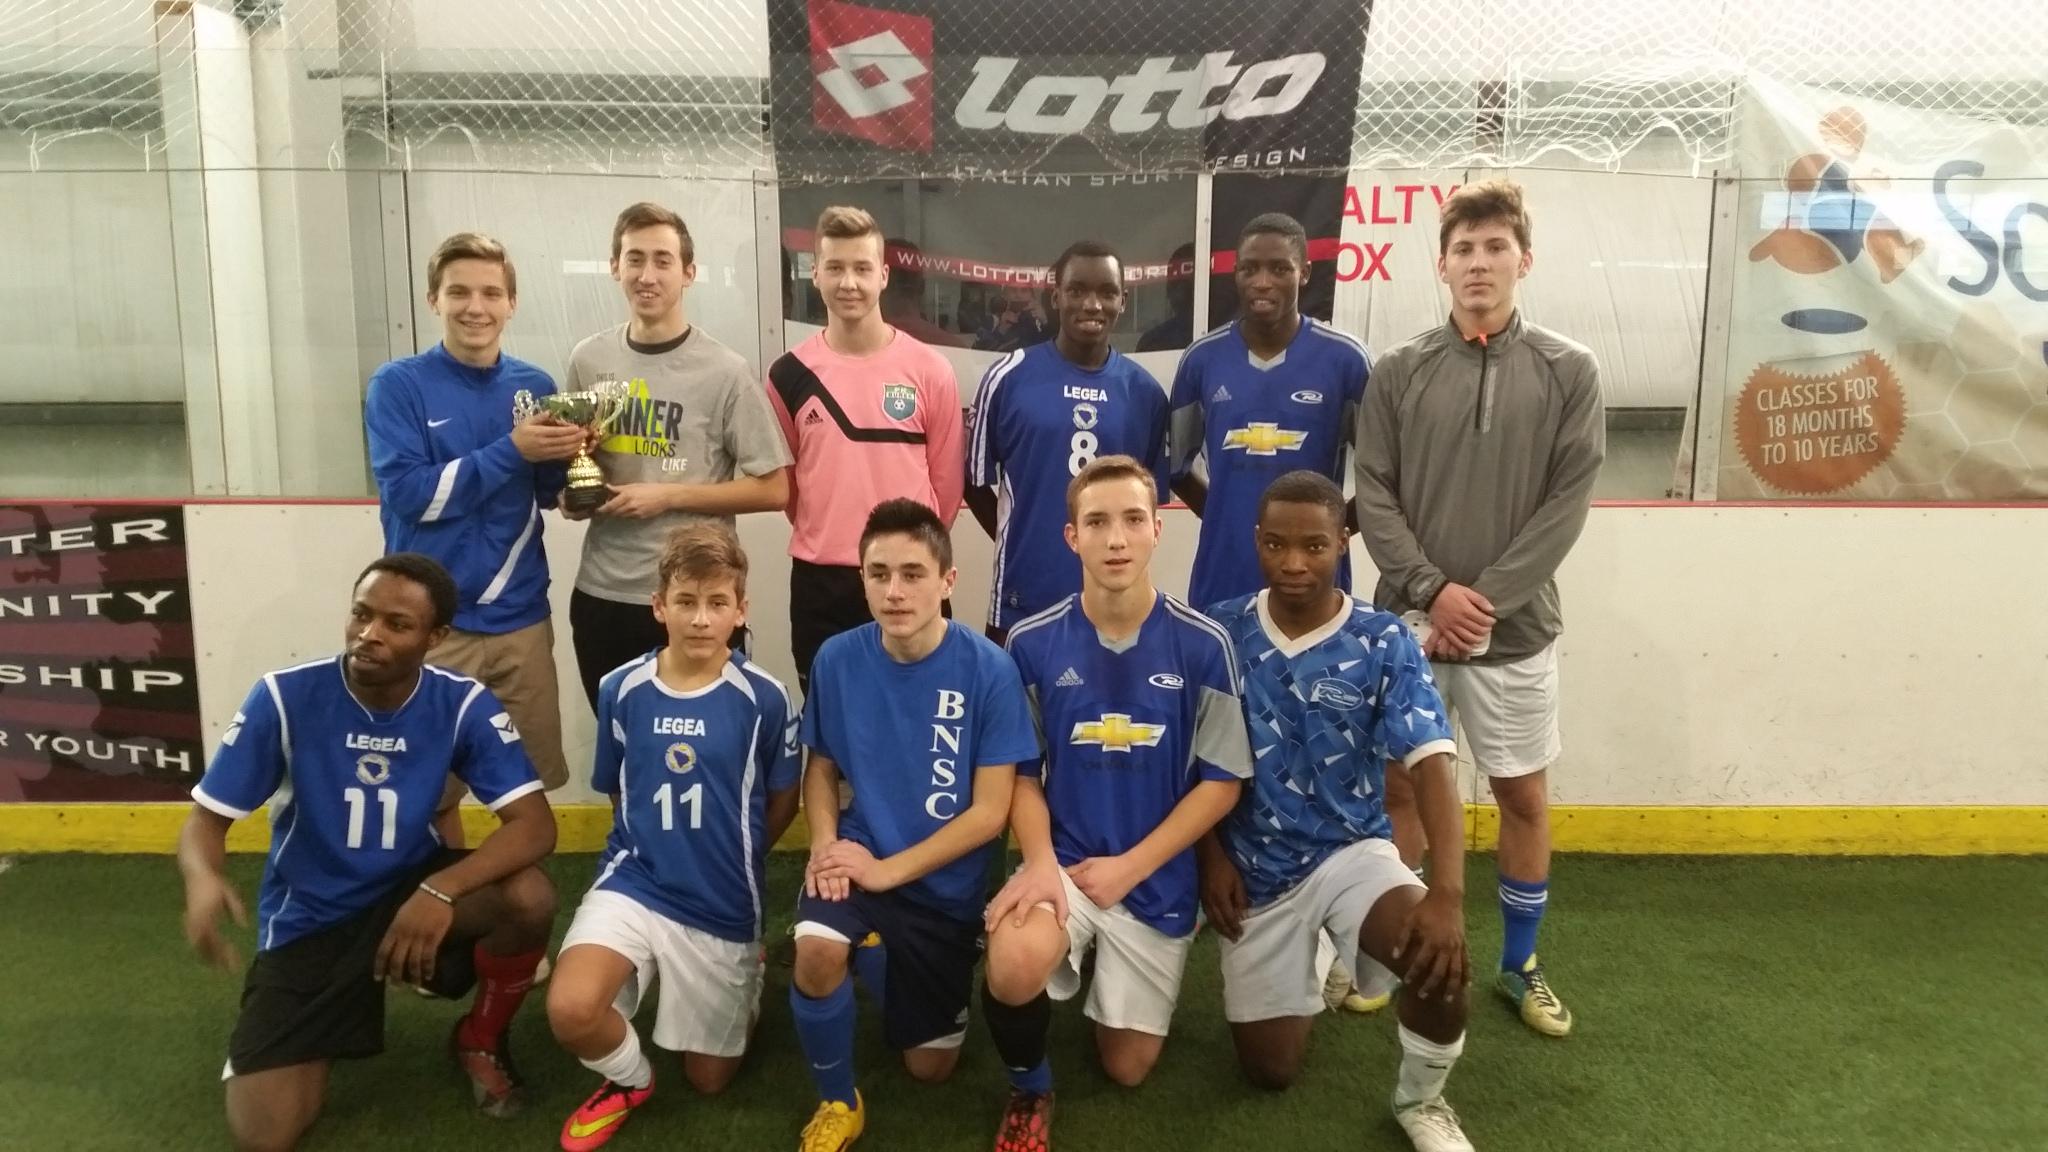 Blue Balls Of Destiny Hs Boys 2014 Iisa Indoor Soccer Champions